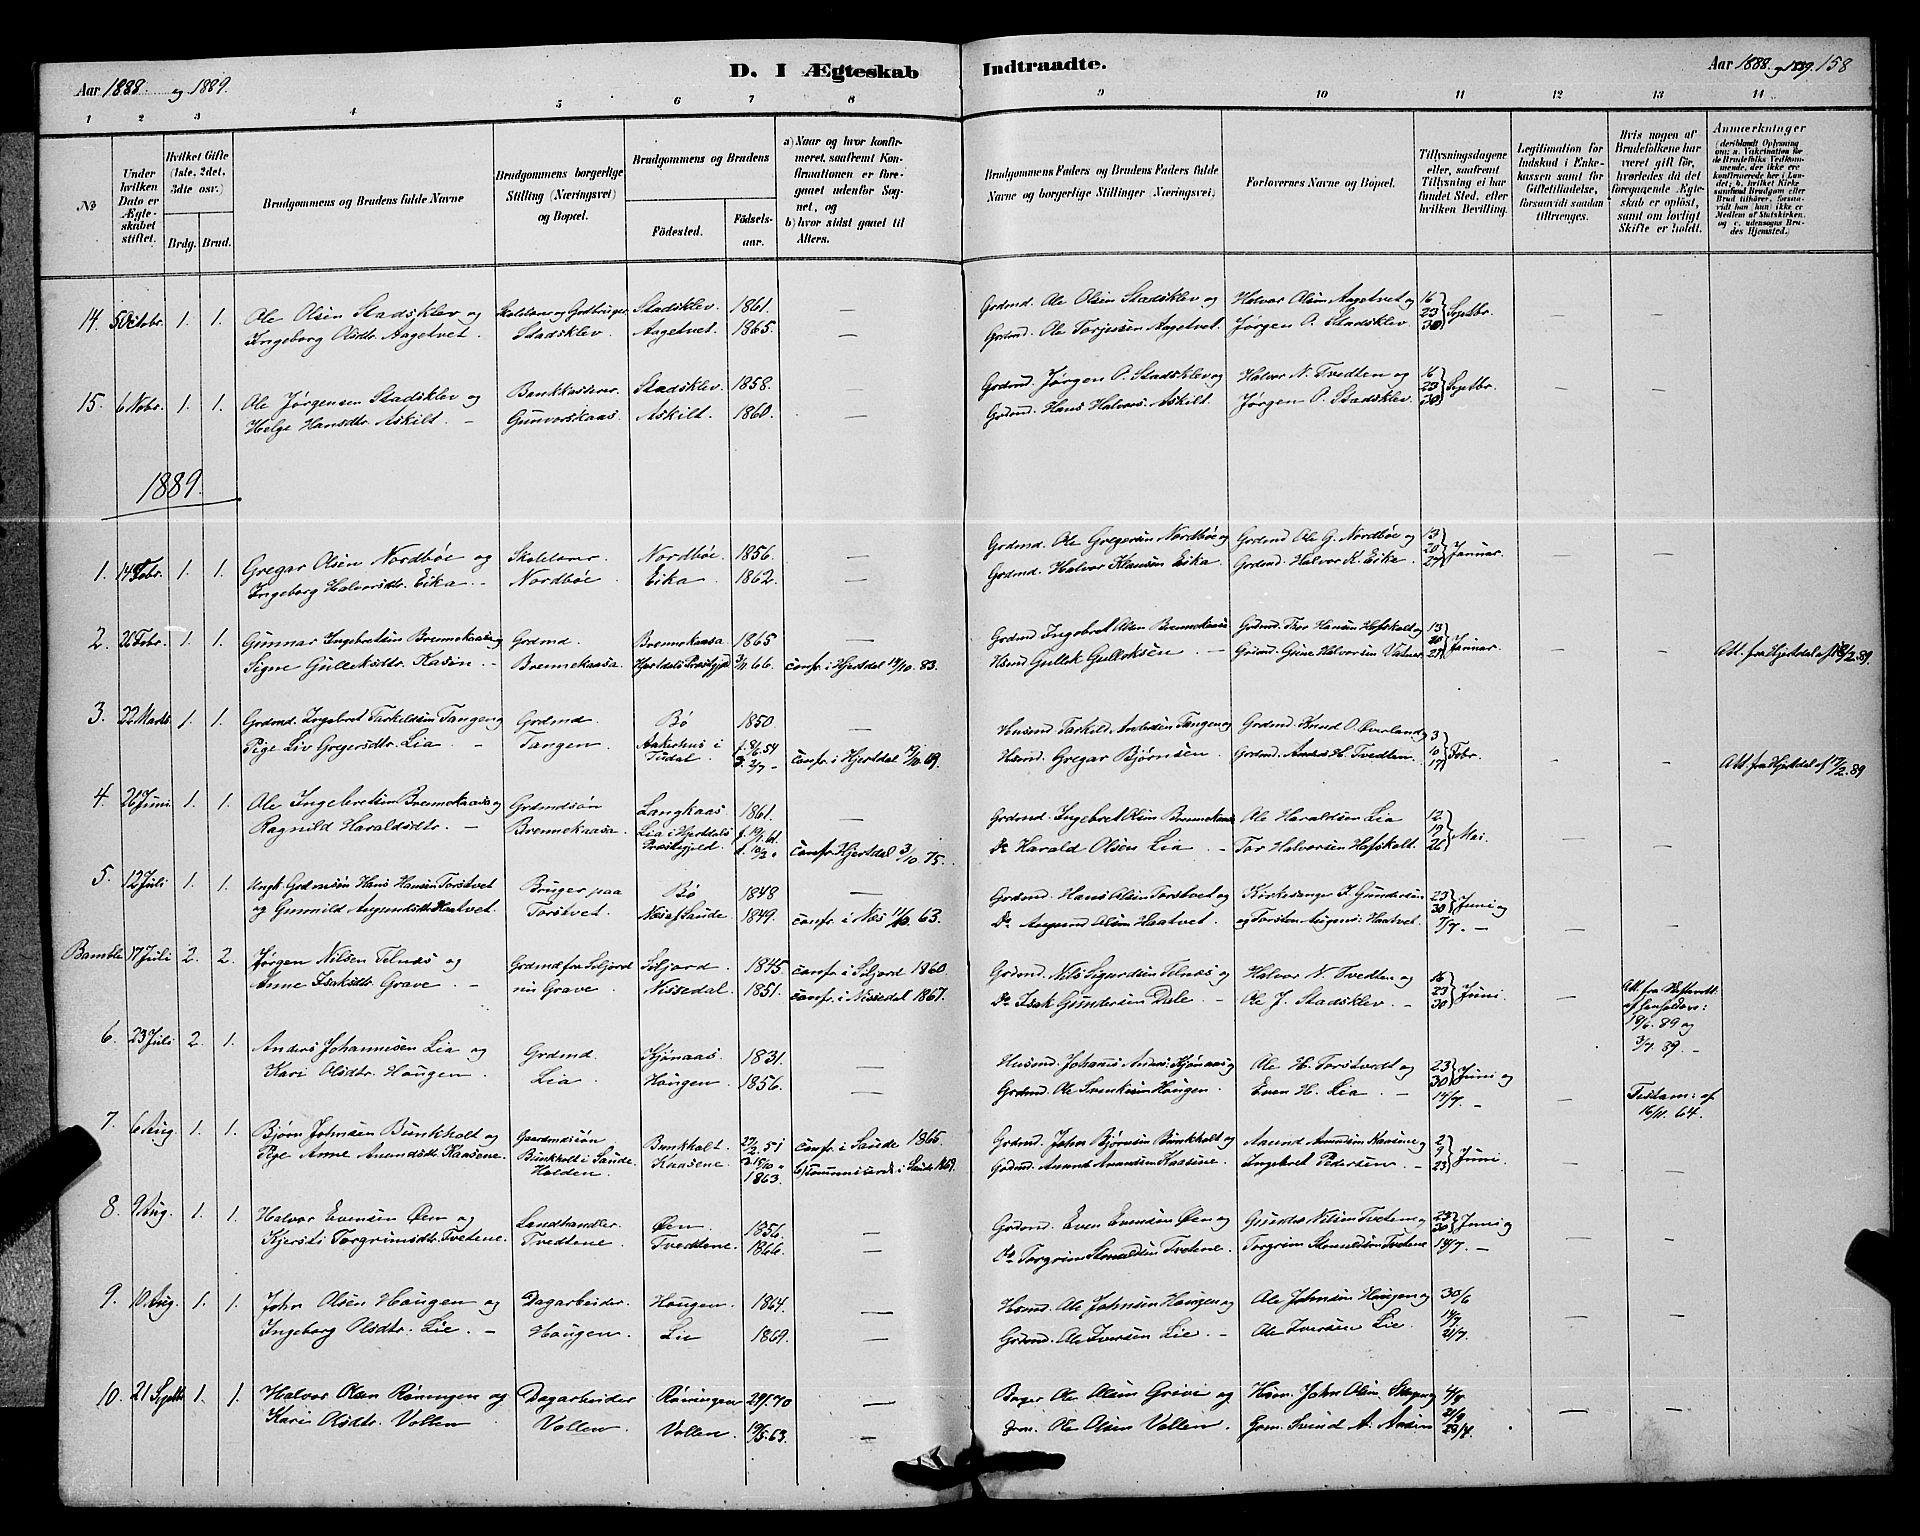 SAKO, Bø kirkebøker, G/Ga/L0005: Klokkerbok nr. 5, 1883-1897, s. 158